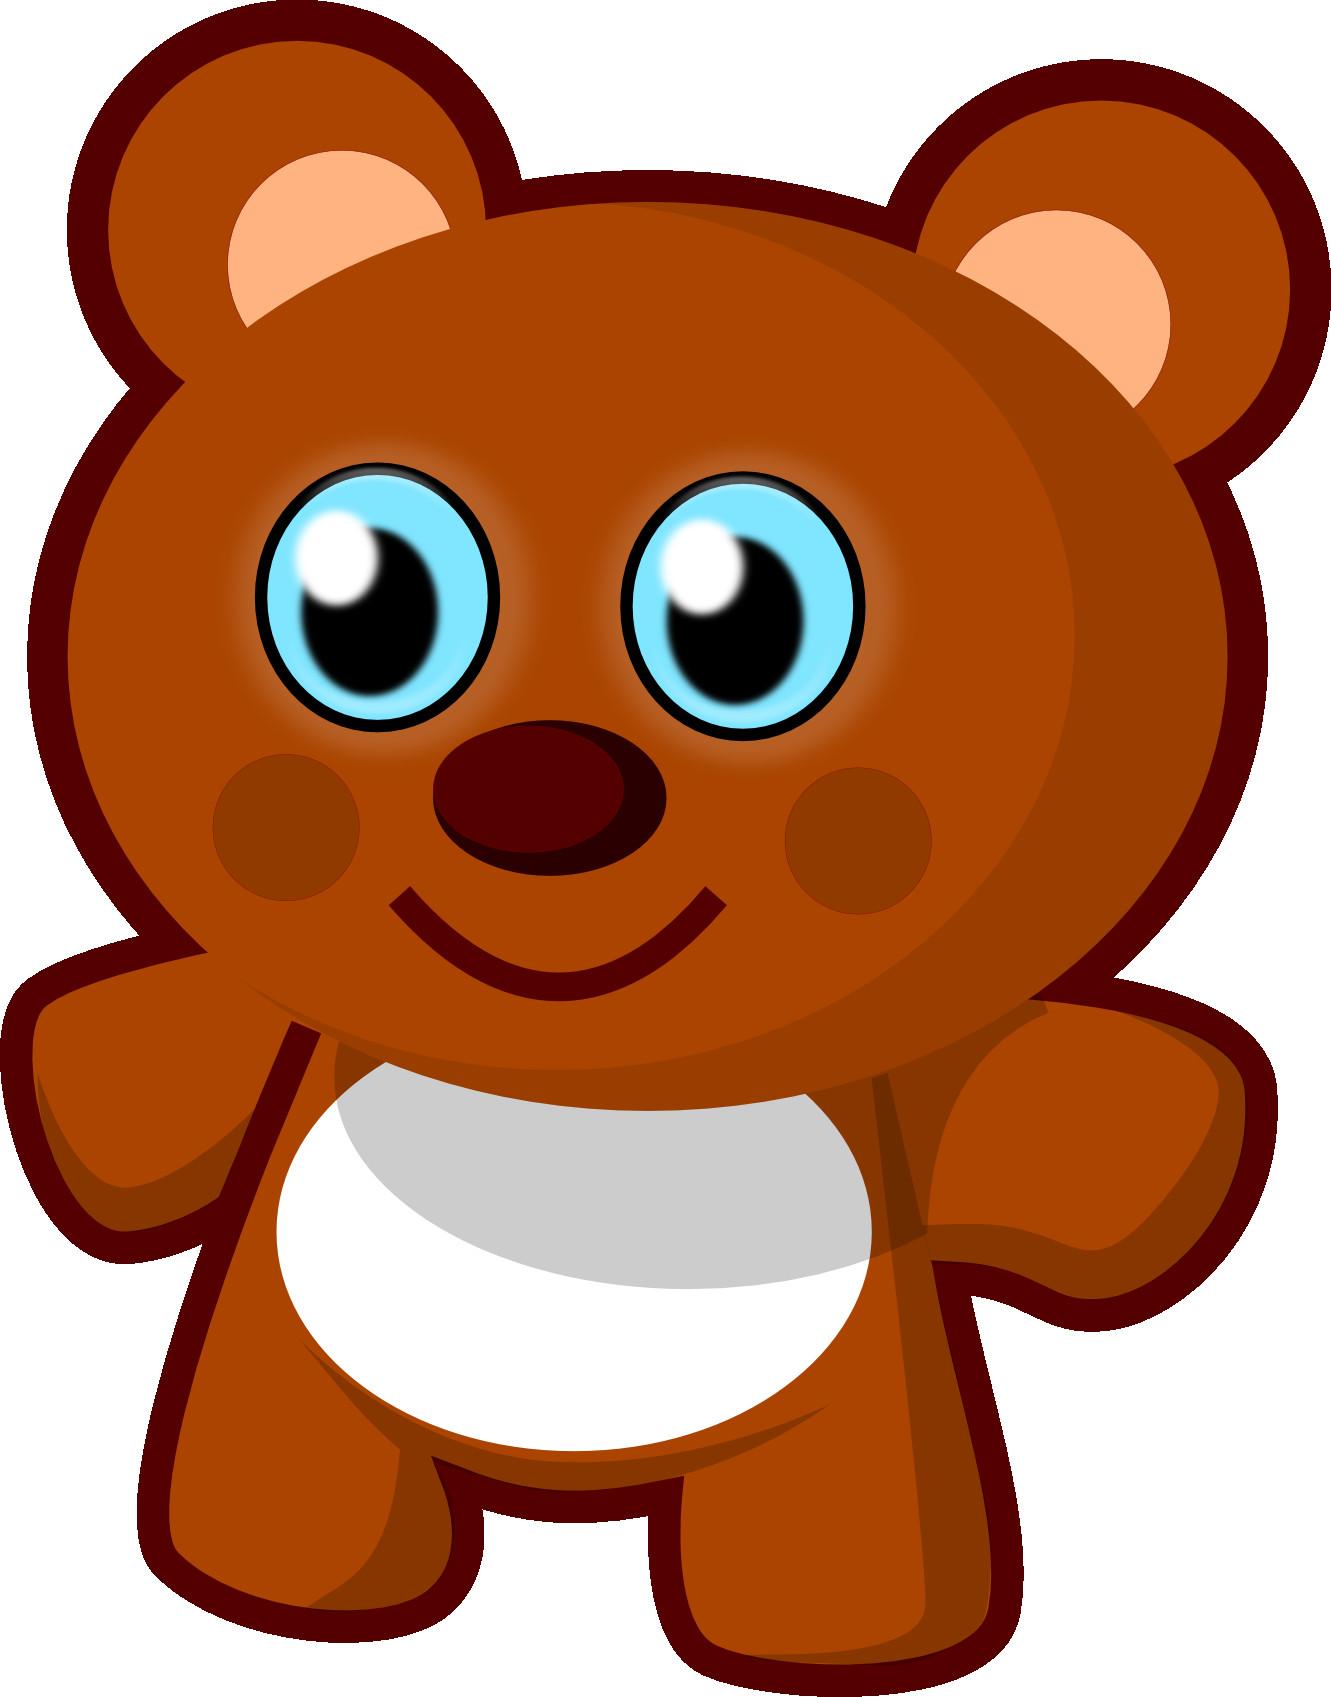 1331x1697 Brown Bear American Black Mother Clip Art Brilliant Bears Clipart